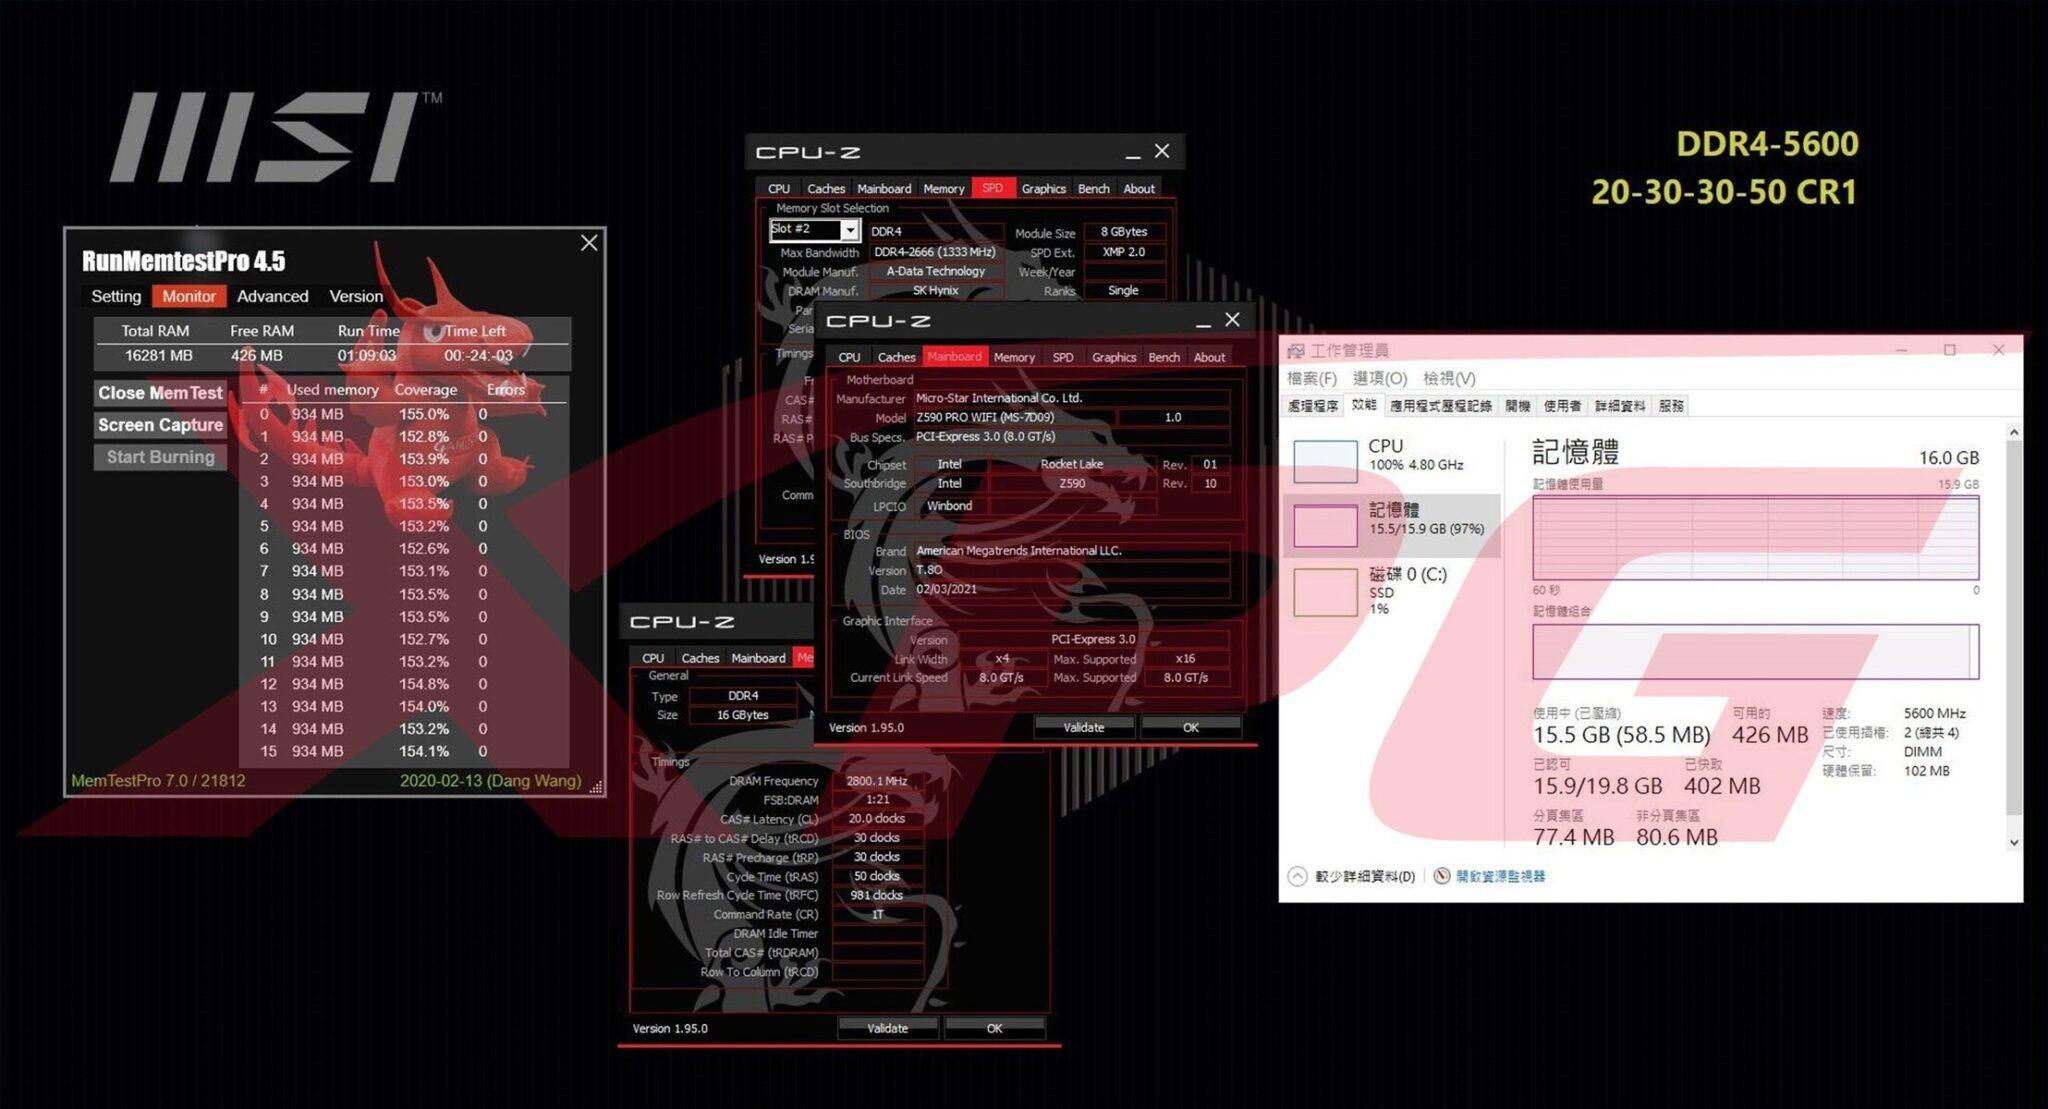 XPG Memory and SSD 01